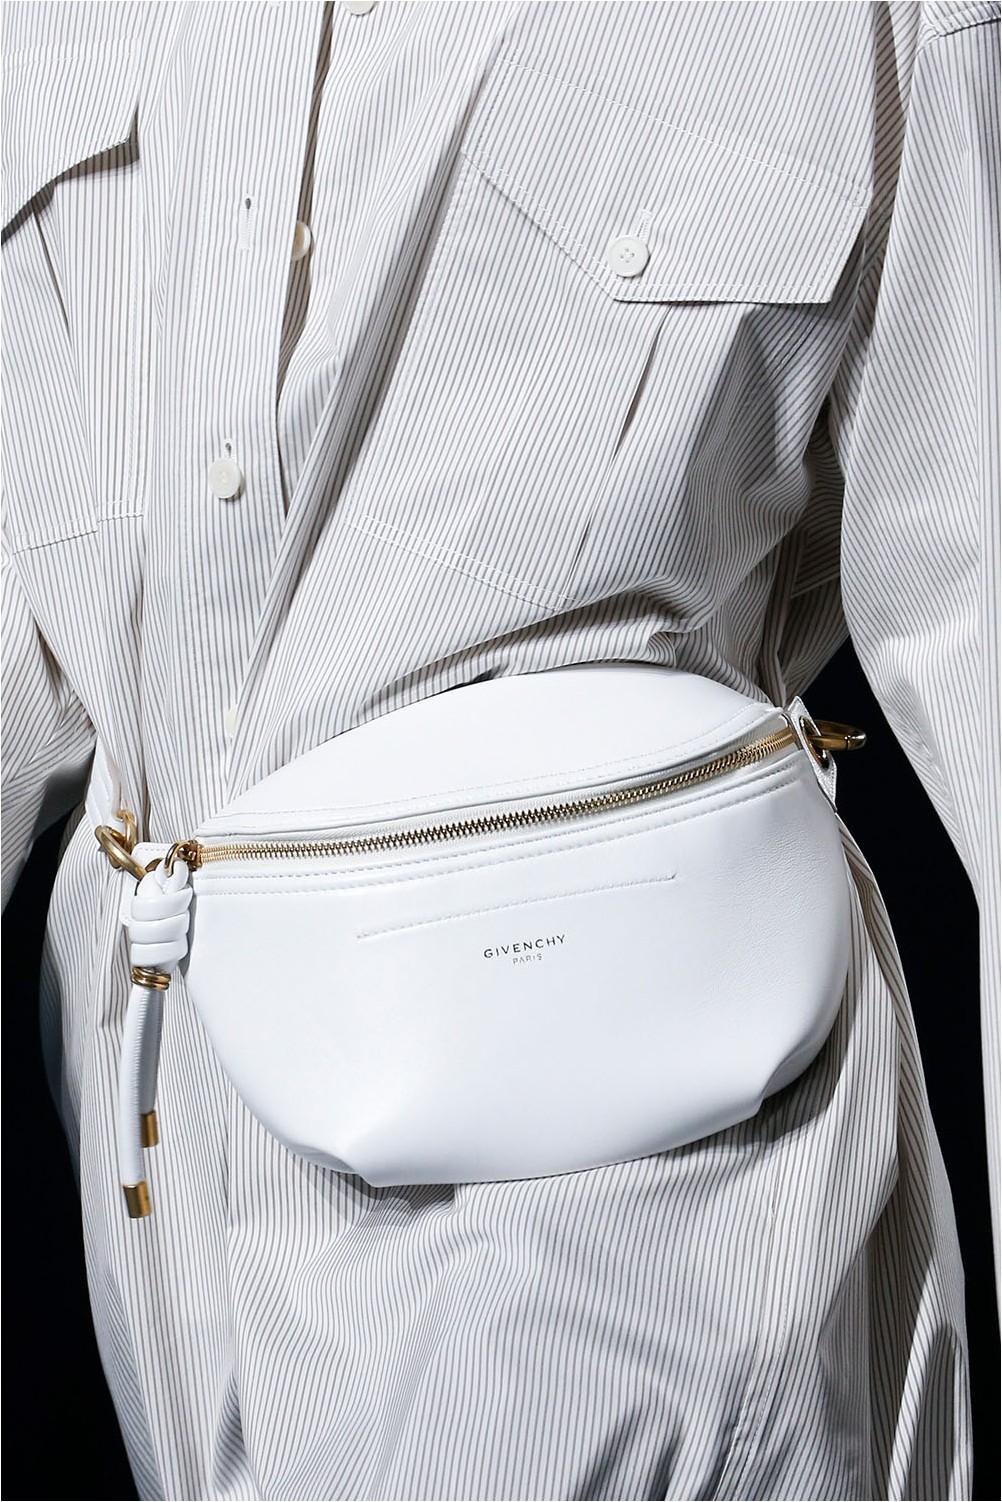 Givenchy Waist Bag